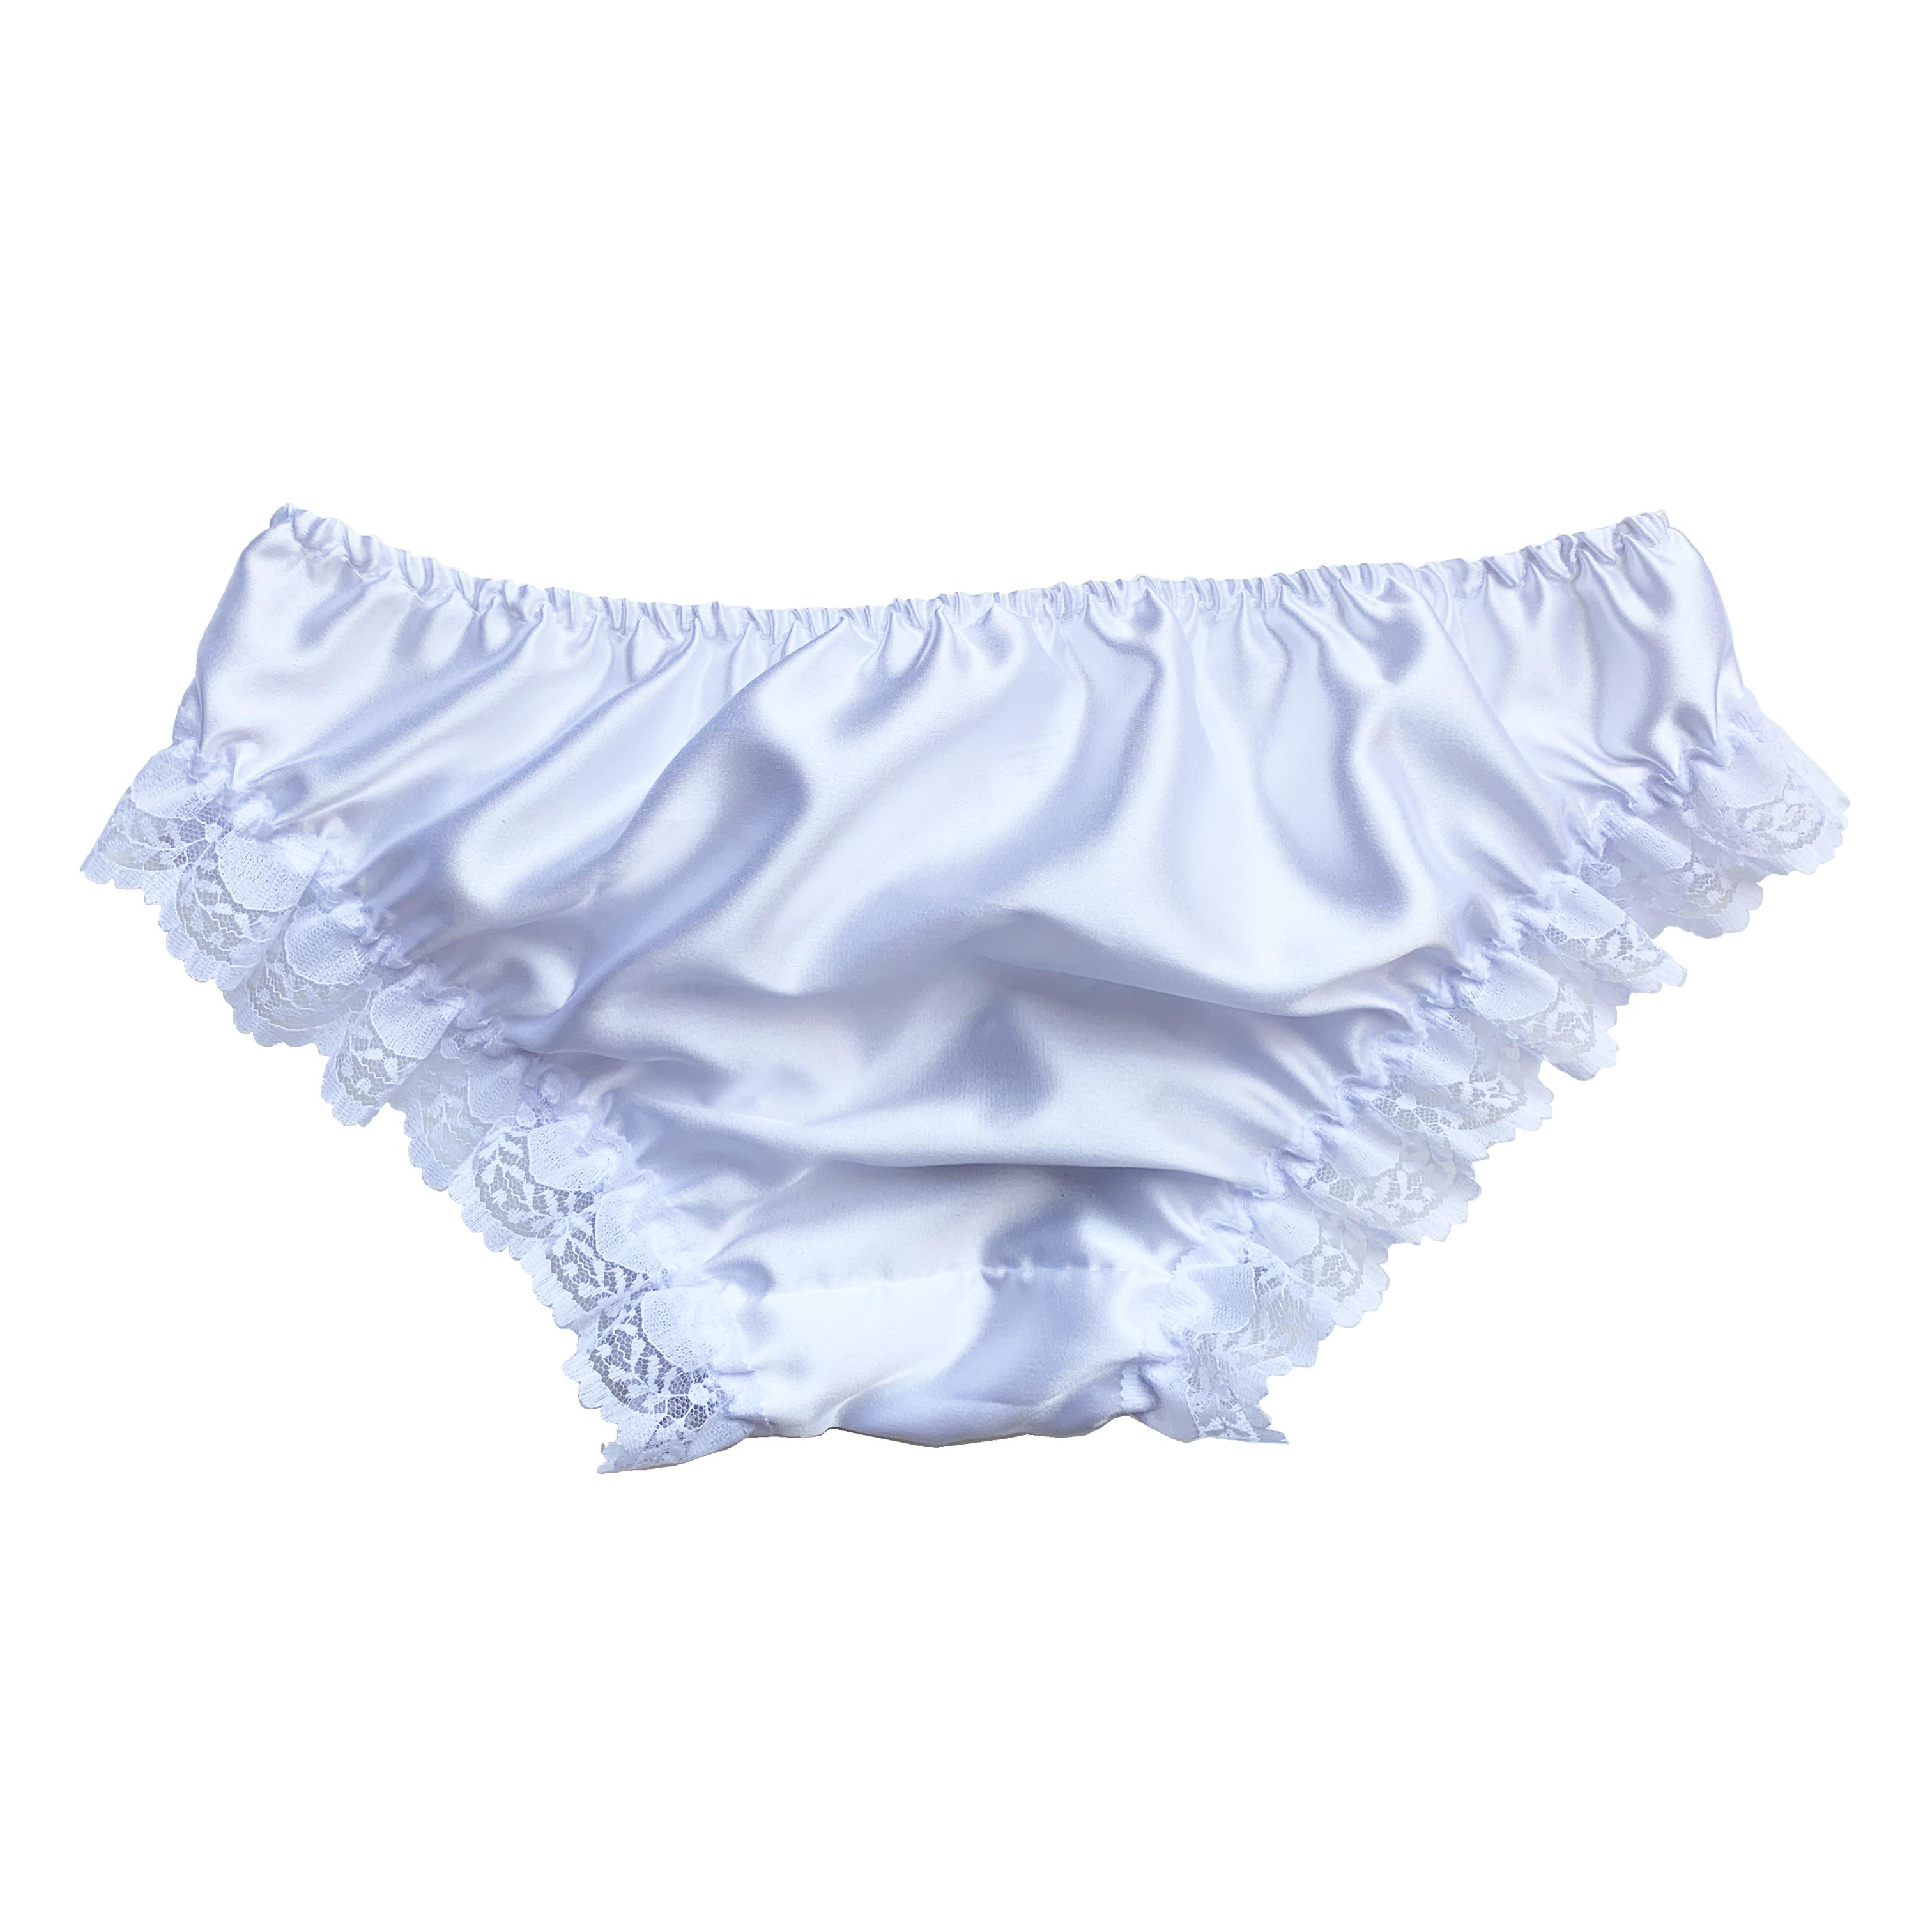 Details about  /New Satin Lace Sissy Frilly Full Panties Bikini Knicker Underwear Size 10-20